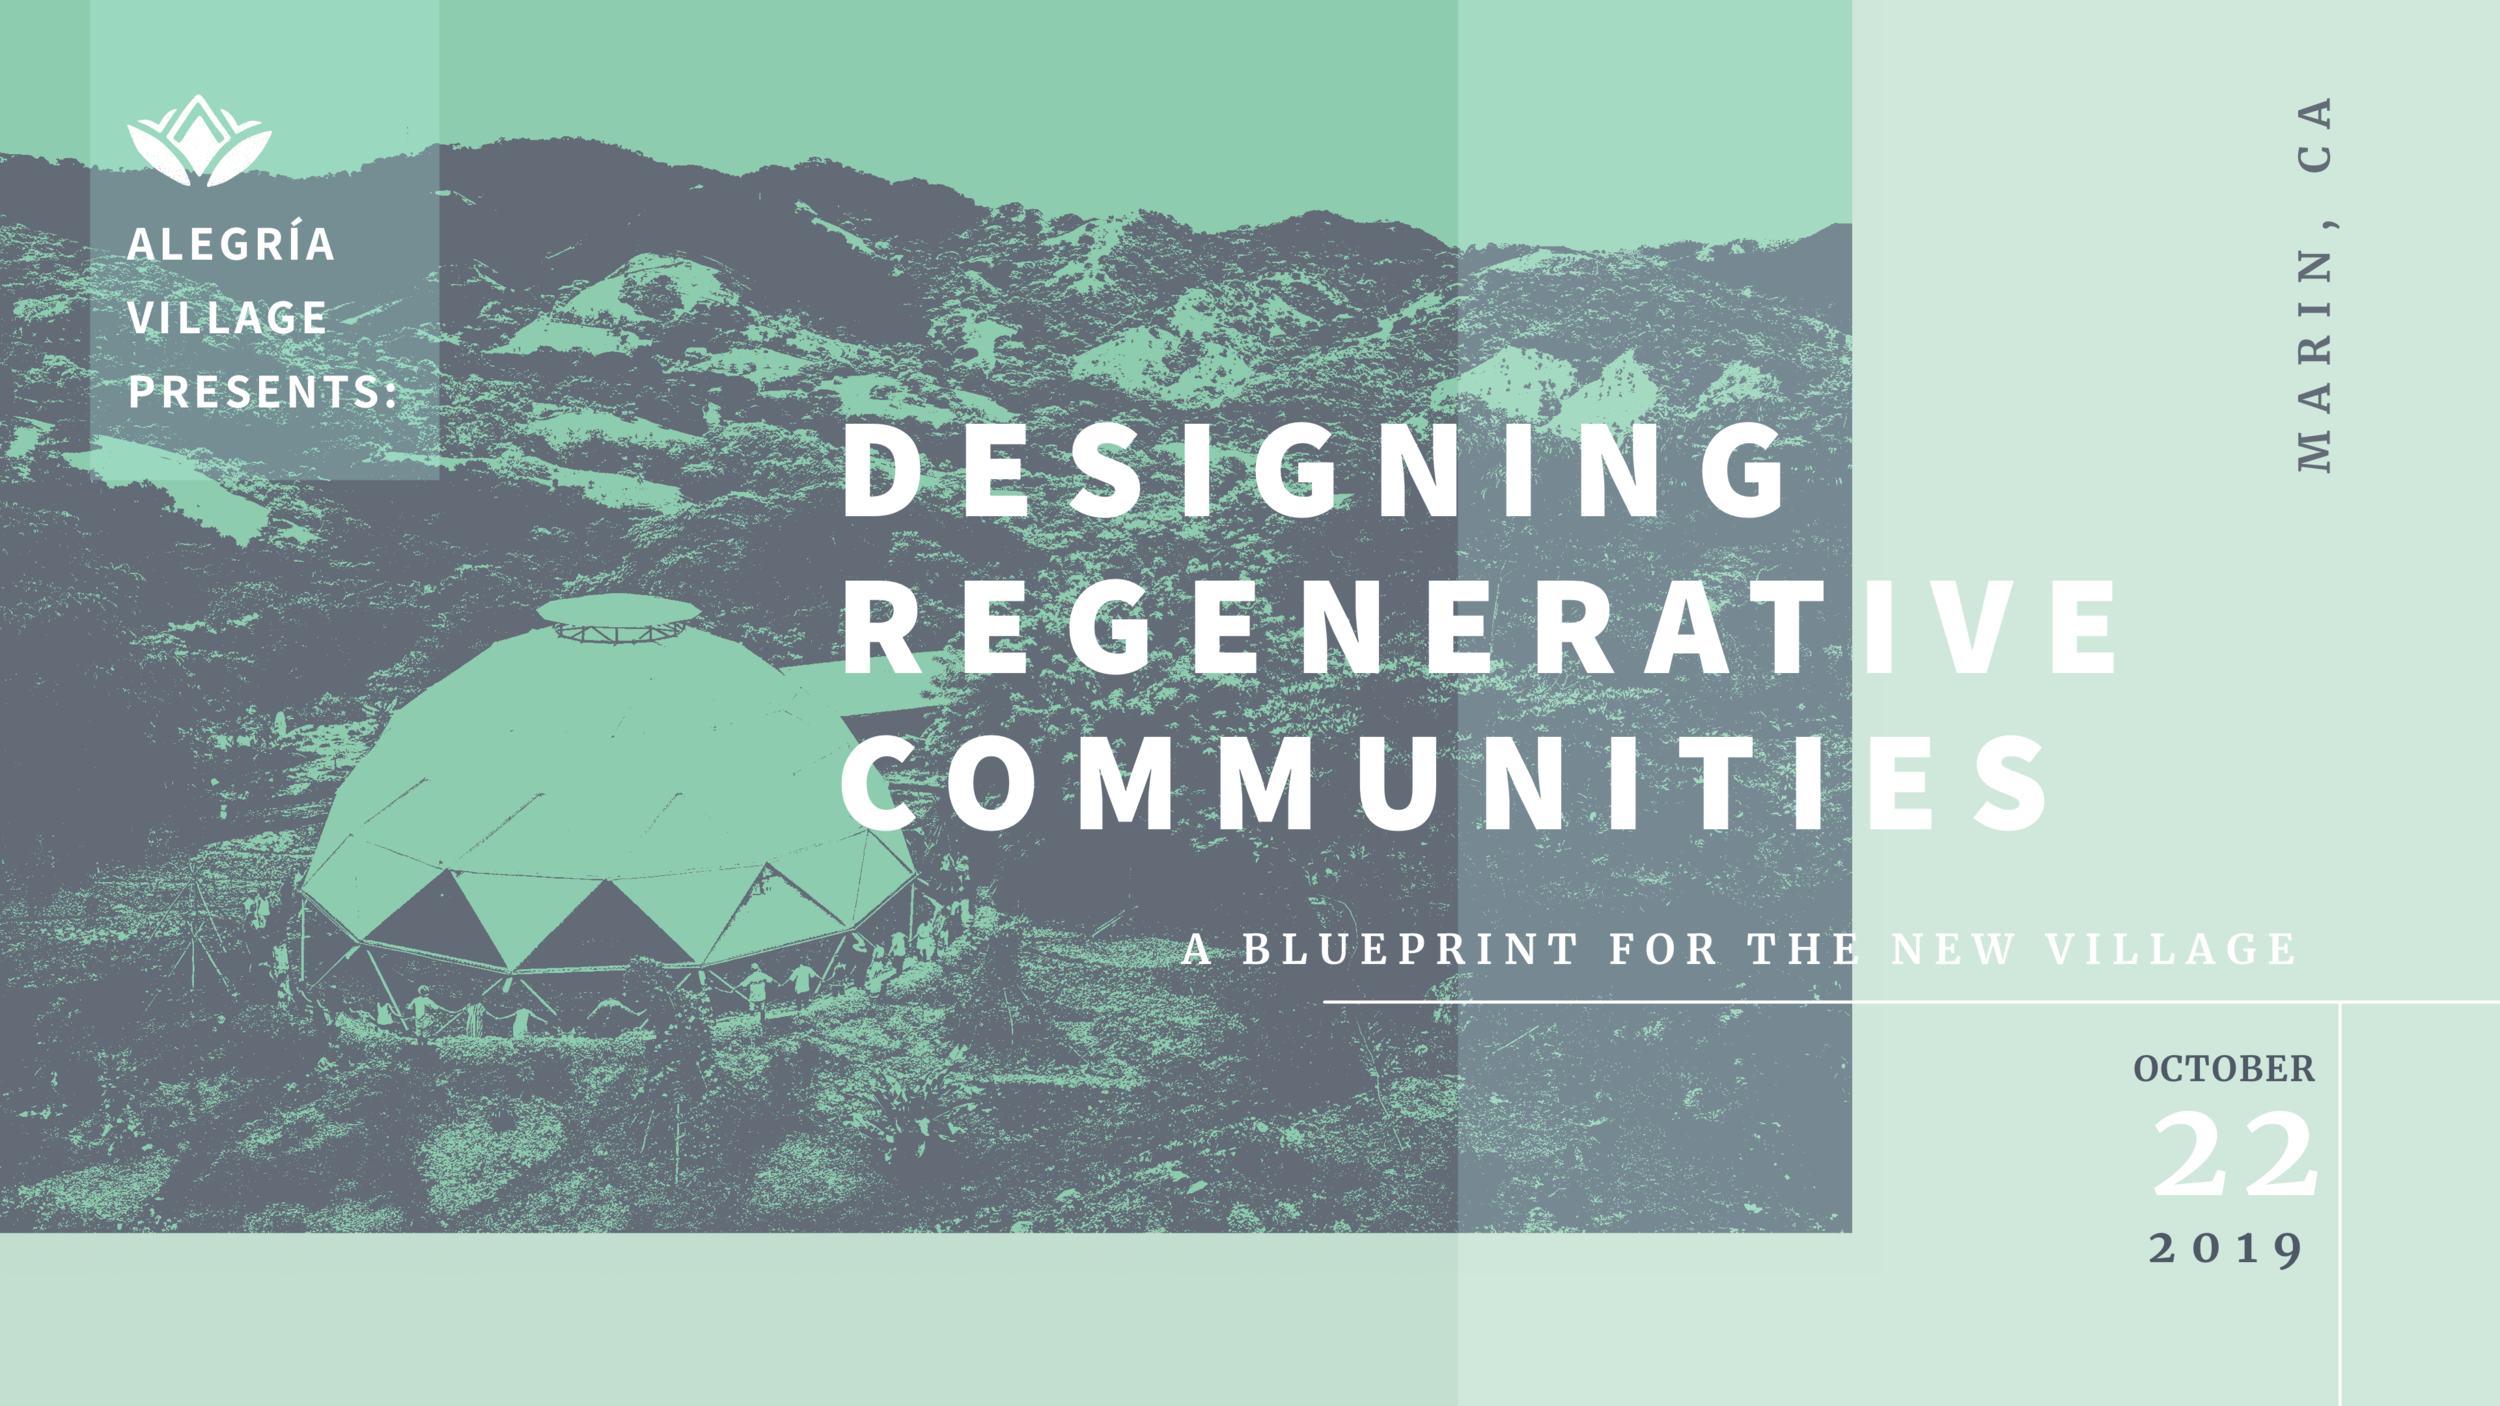 designing-regen-comm-marin-facebook (1).png